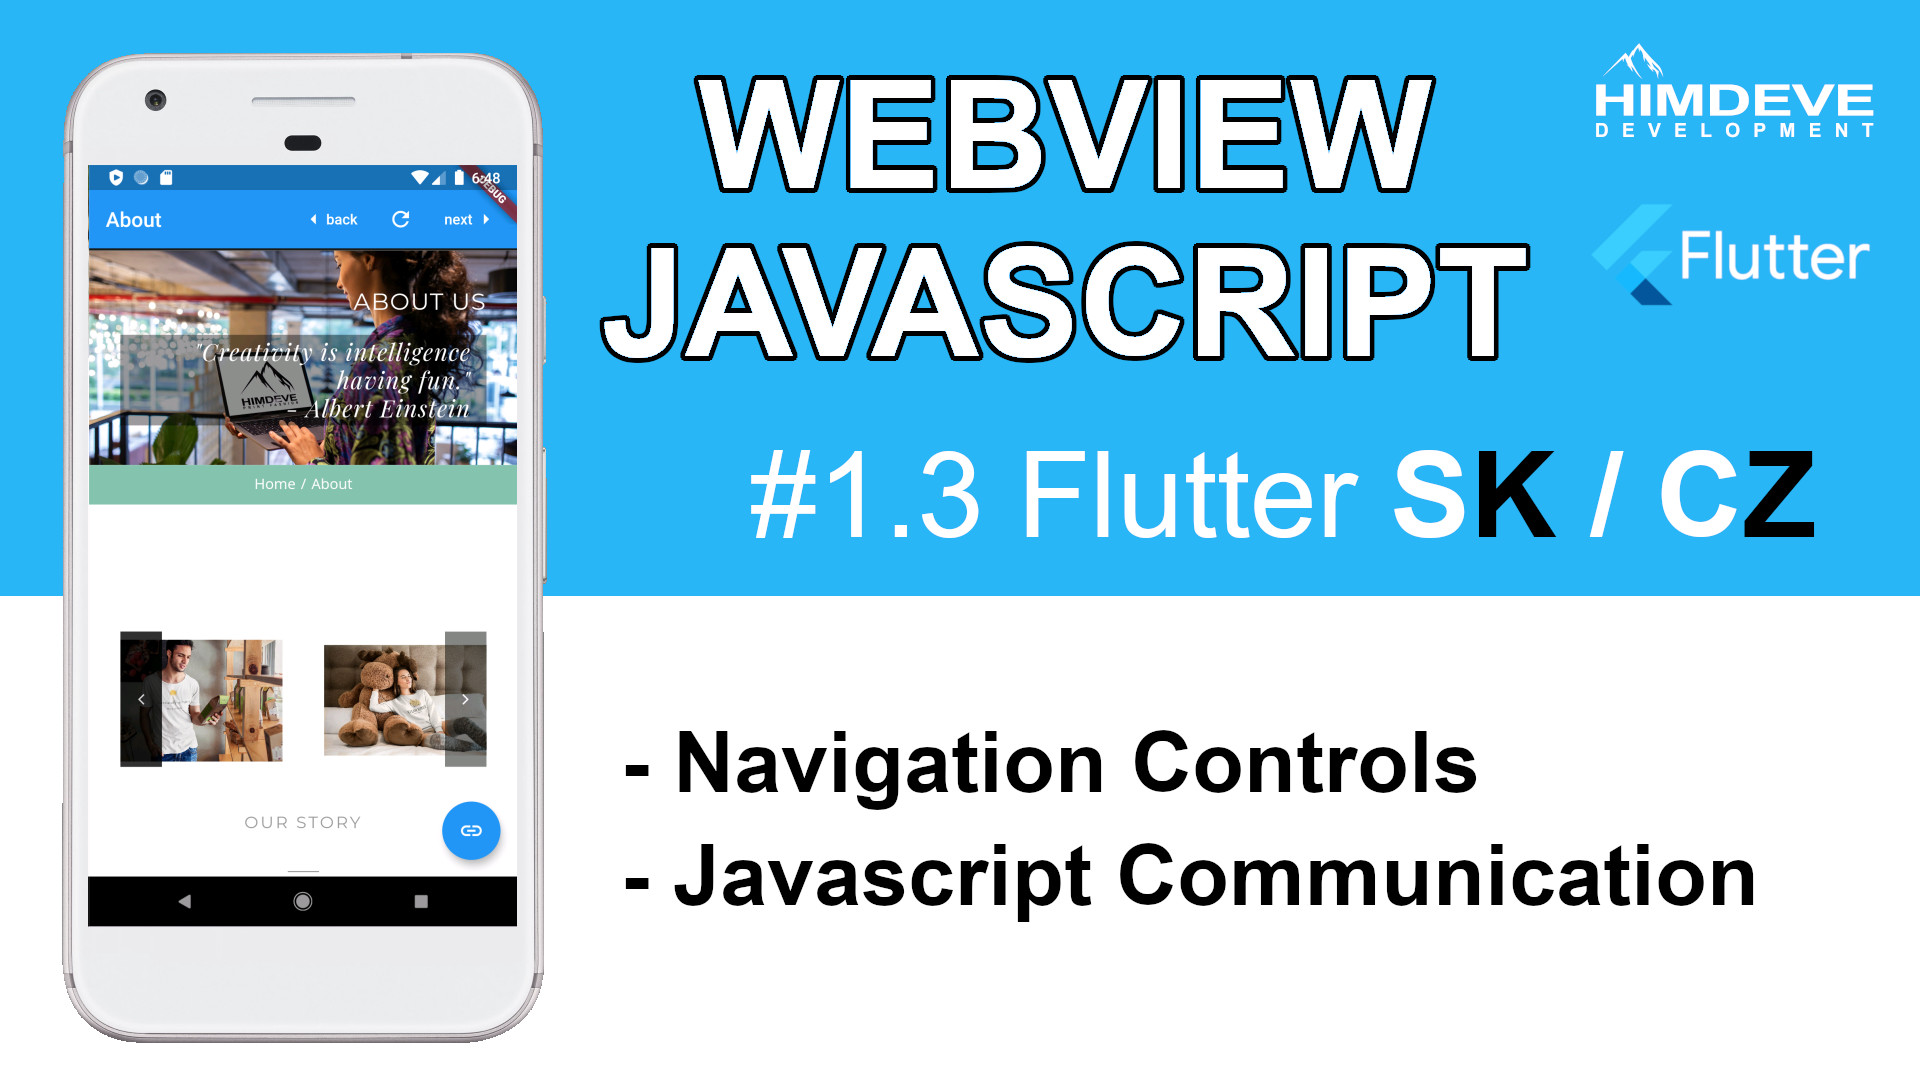 #1_3 Webview Javascript Flutter SK / CZ tutorialy